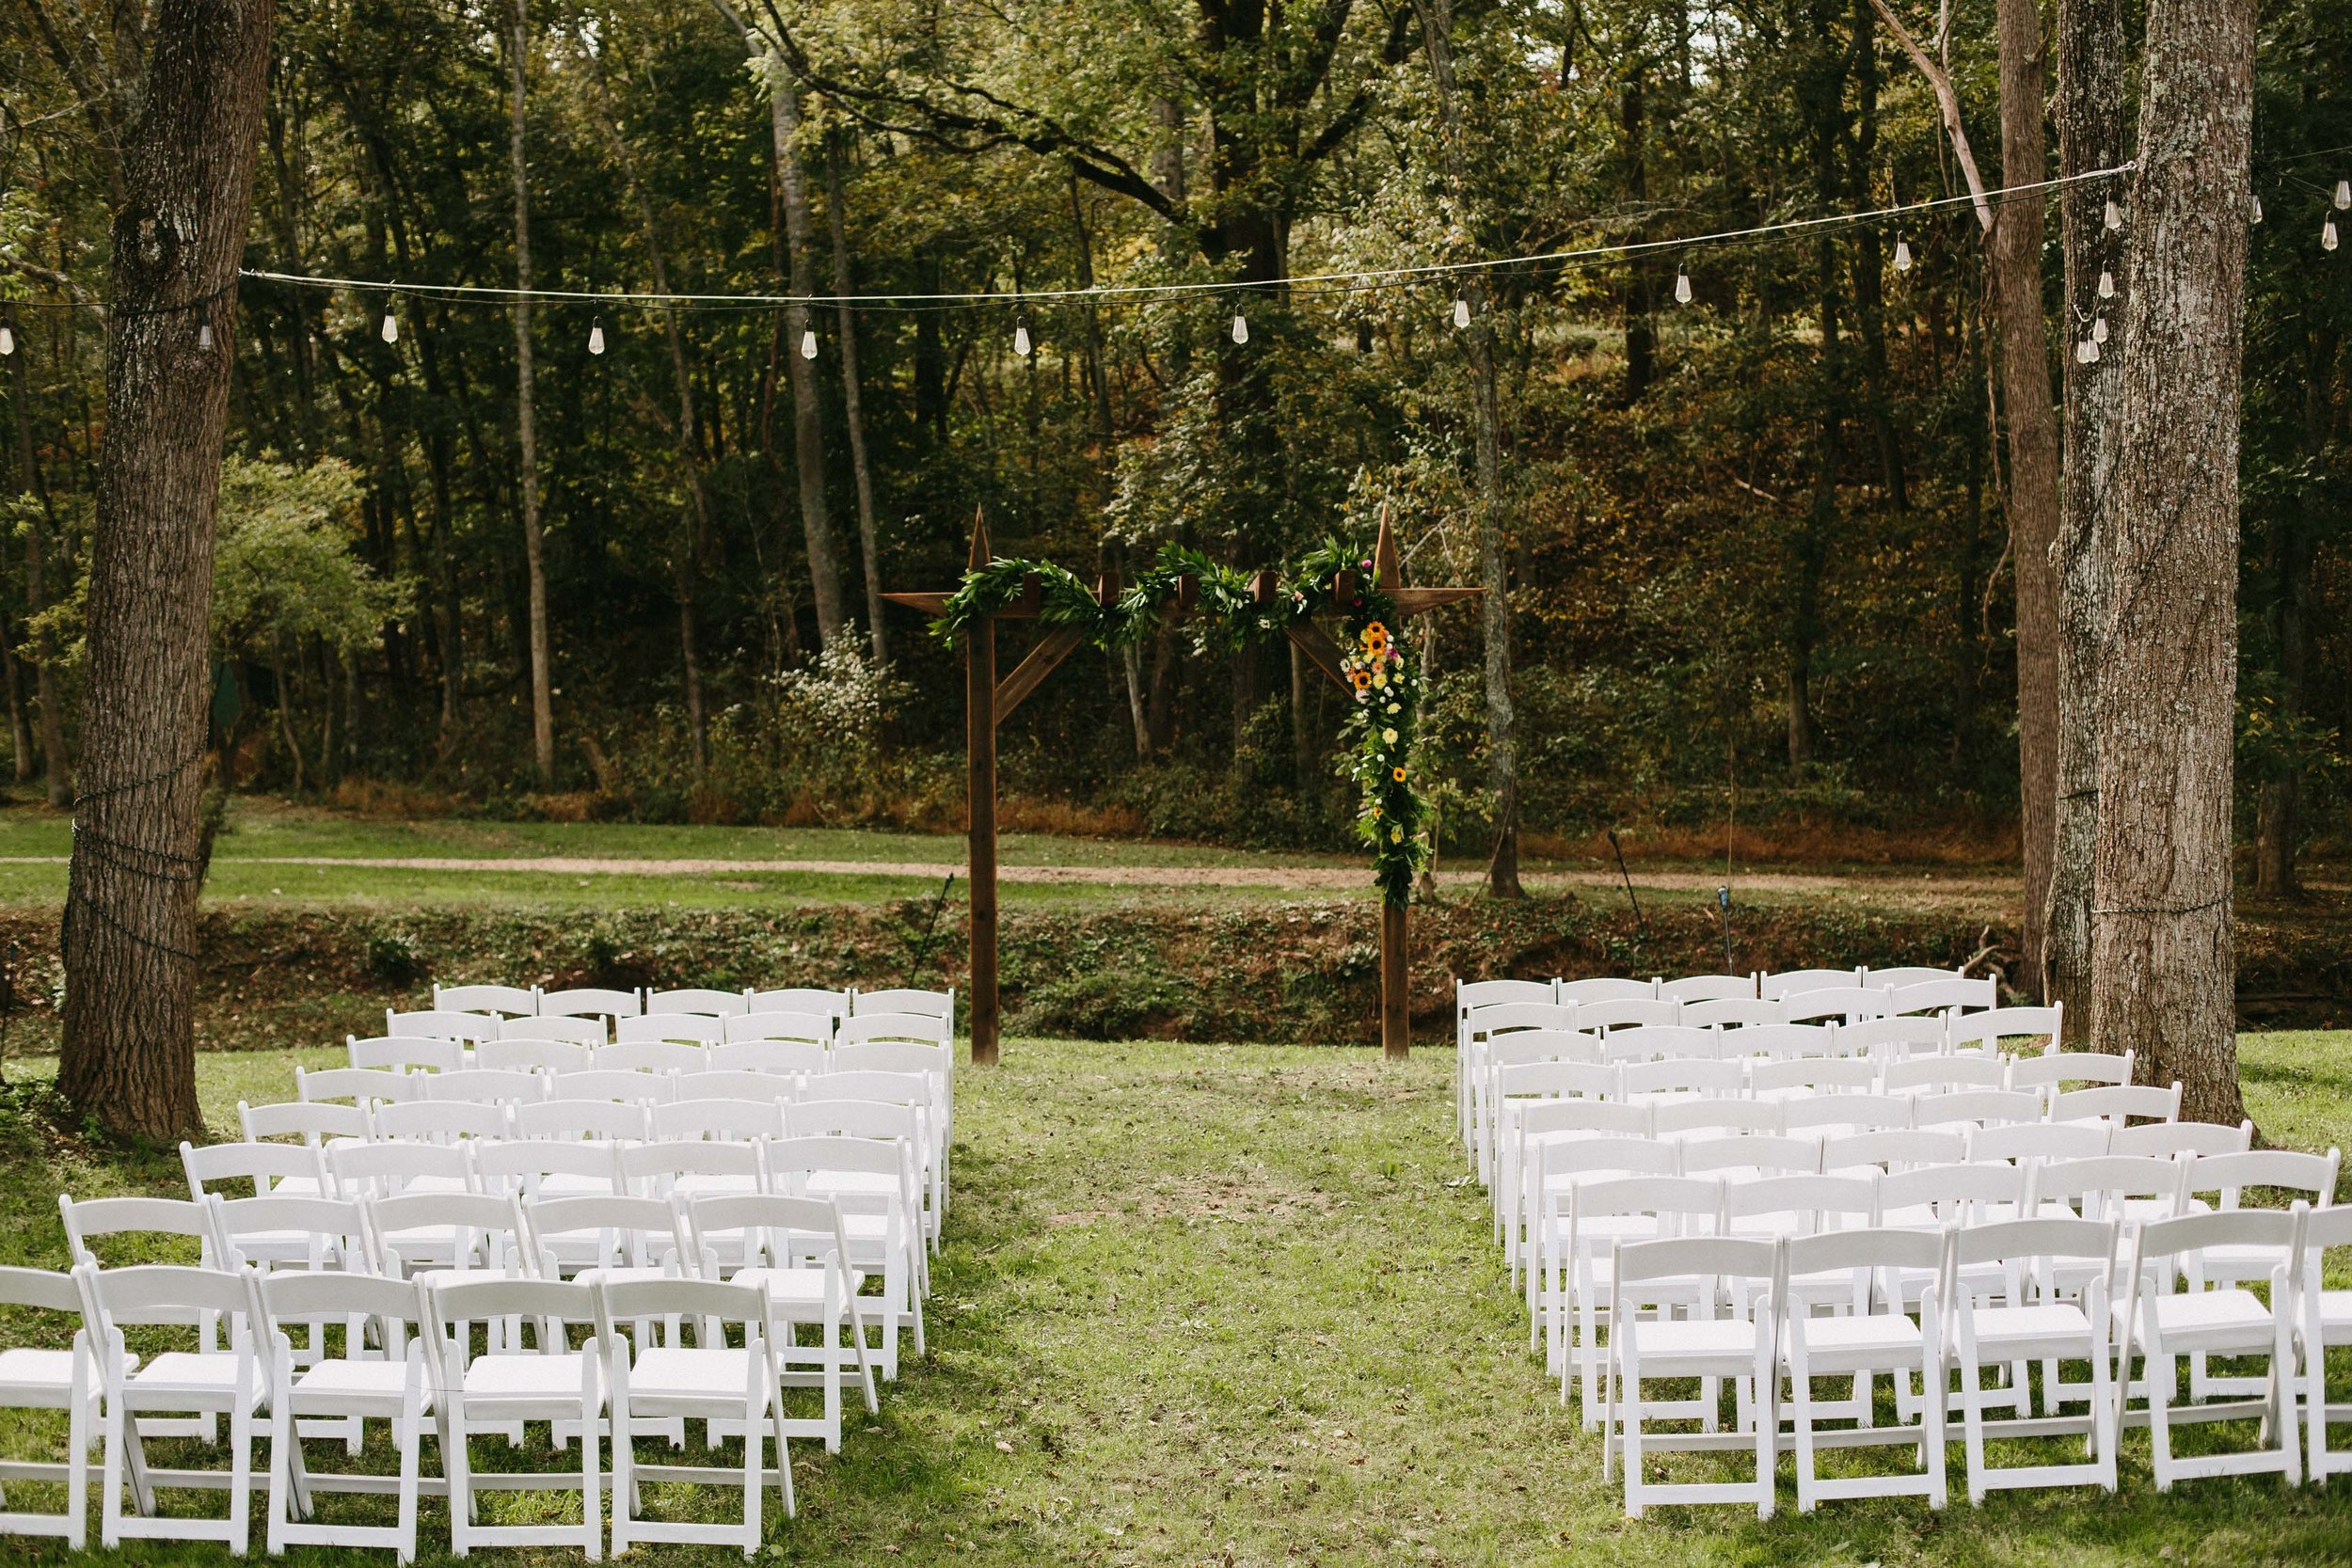 Angeli_Joe__Asheville_Wedding-17.jpg